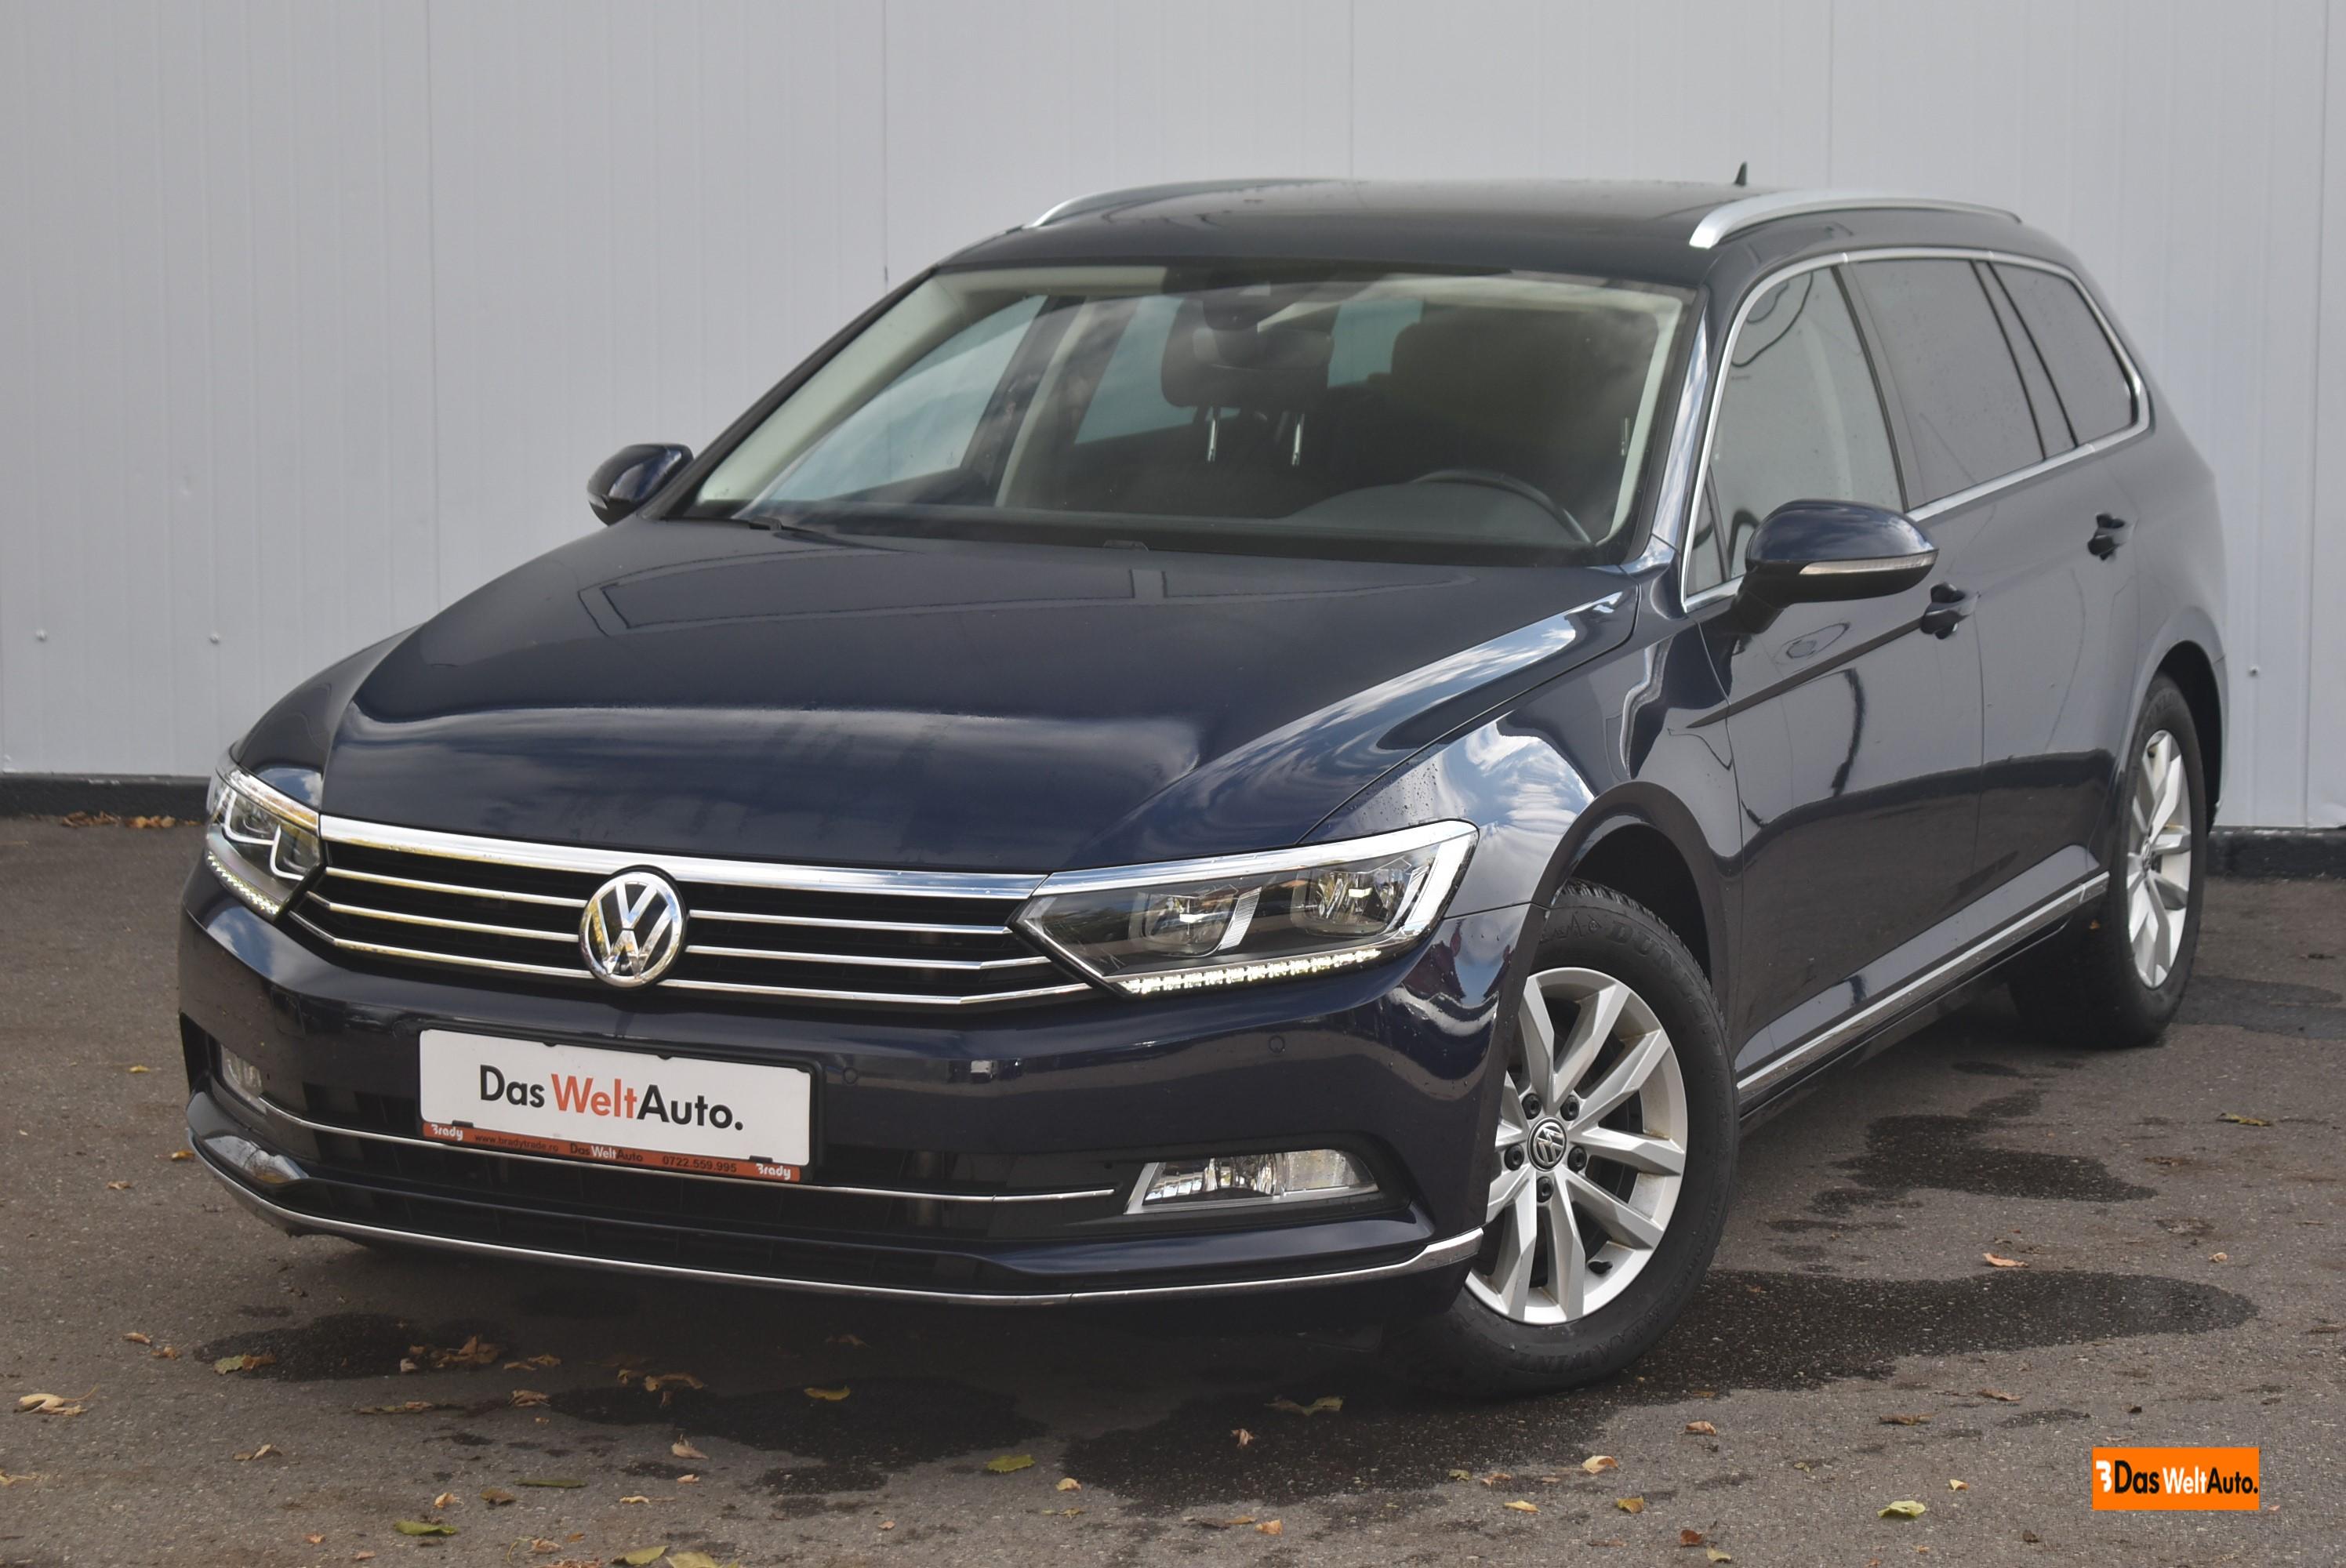 Volkswagen Passat Variant HL 2.0TDI